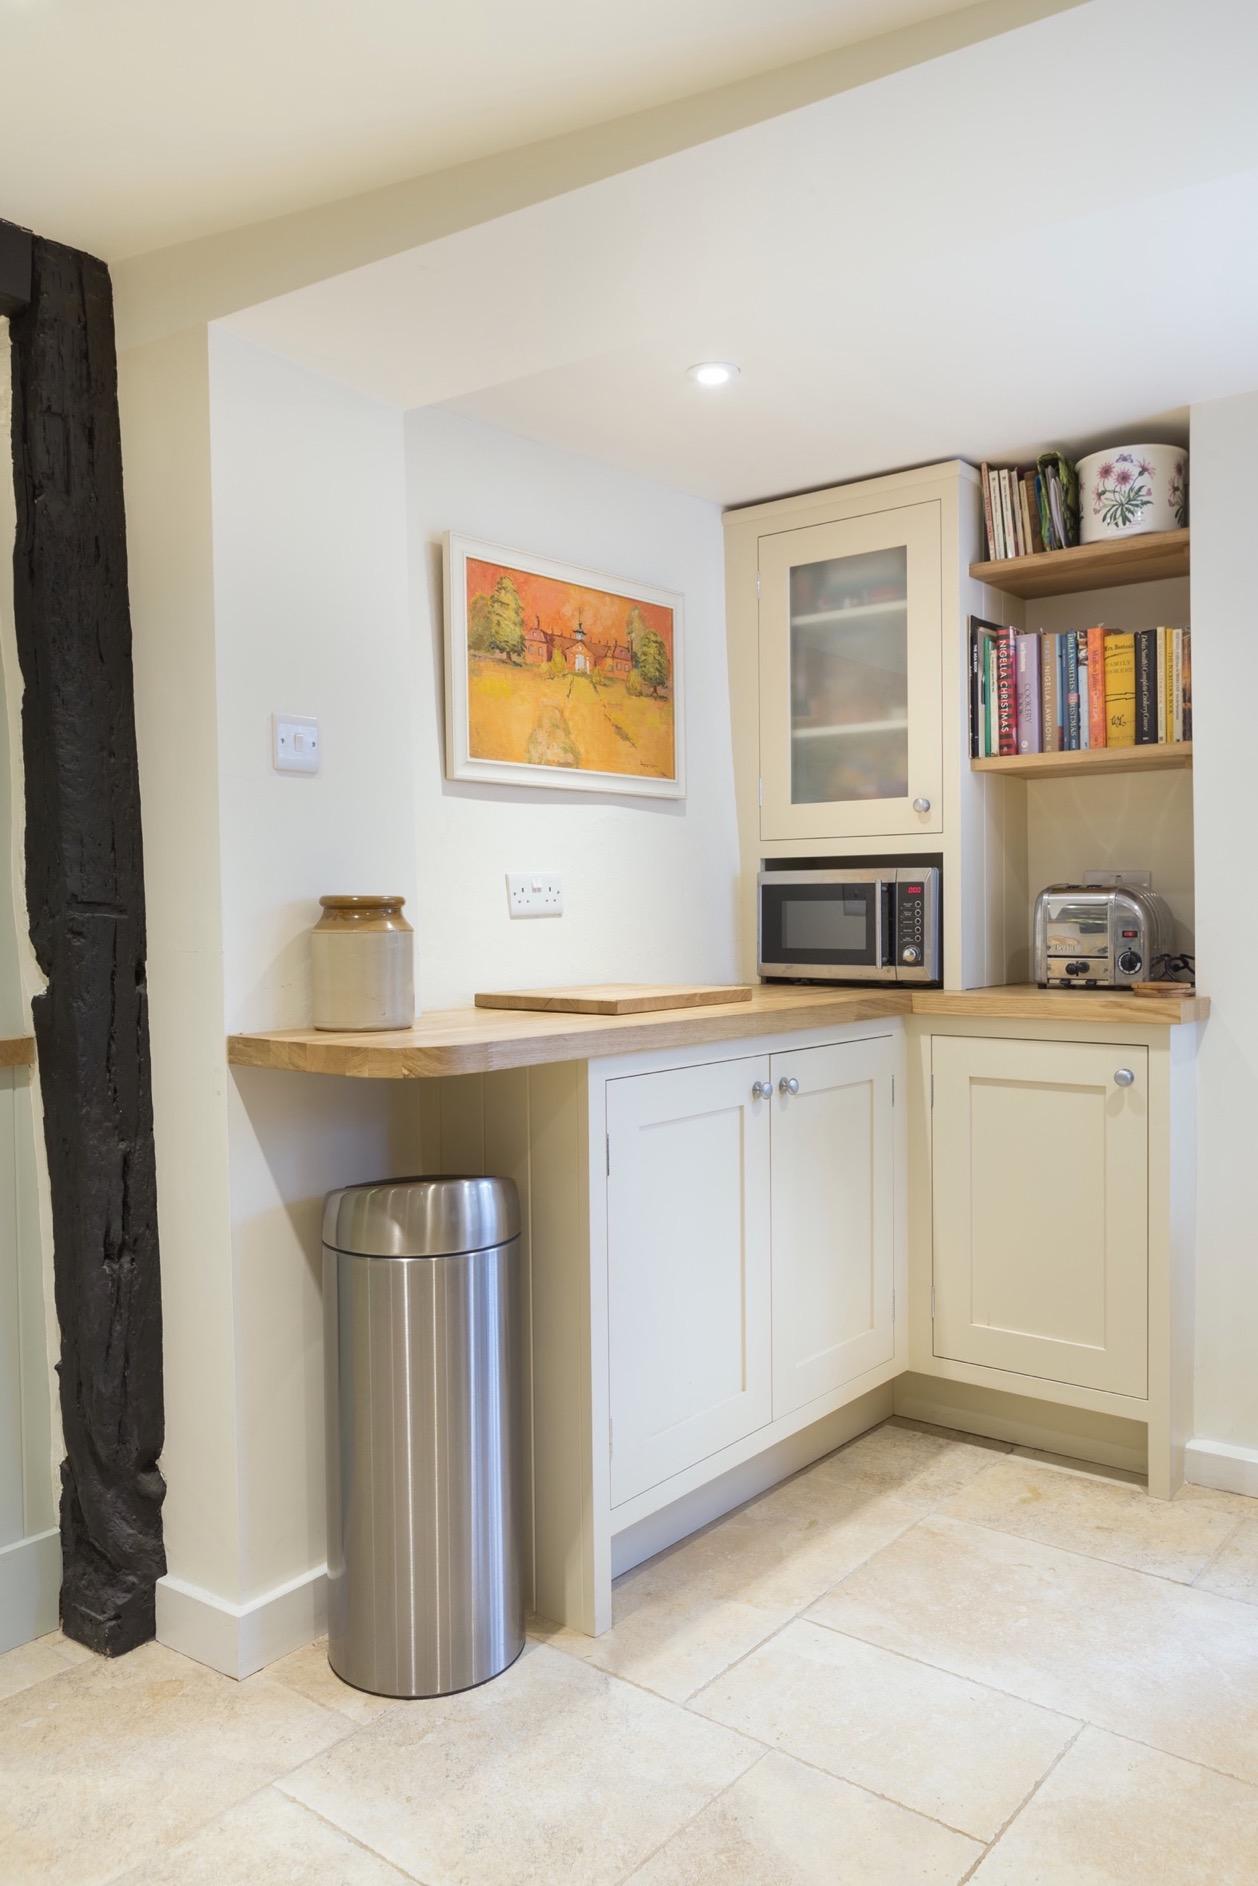 Handpainted worktop dresser with curved oak worktop and glass door amersham buckinhamshire bespoke kitchen inframe 1